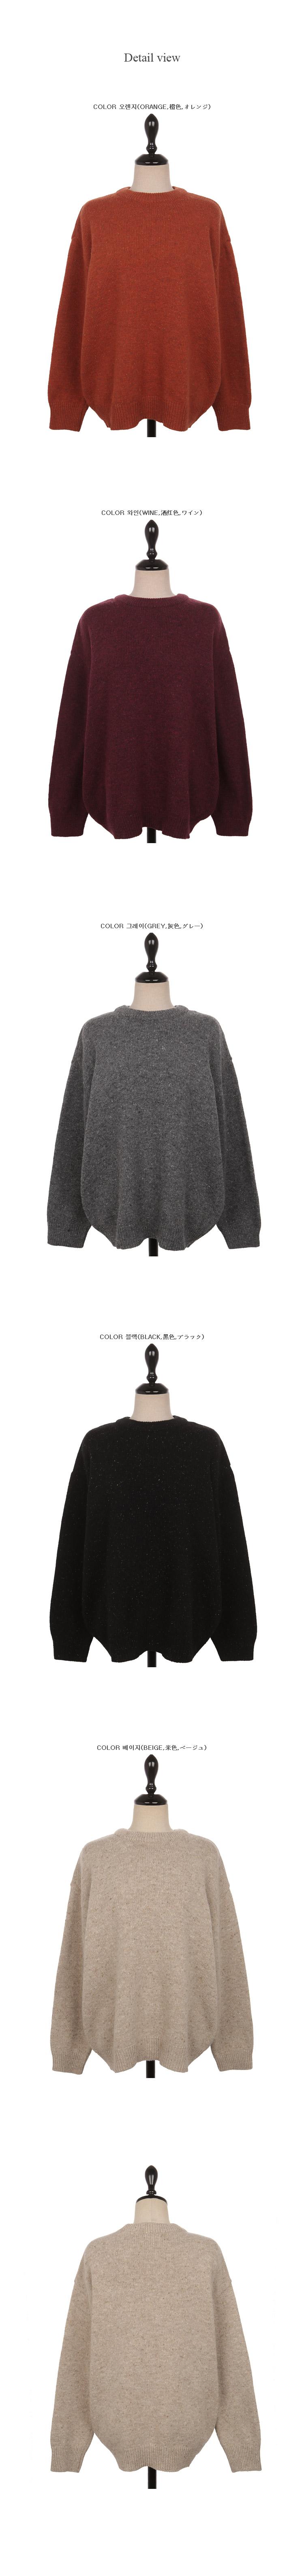 Sainder knit gray